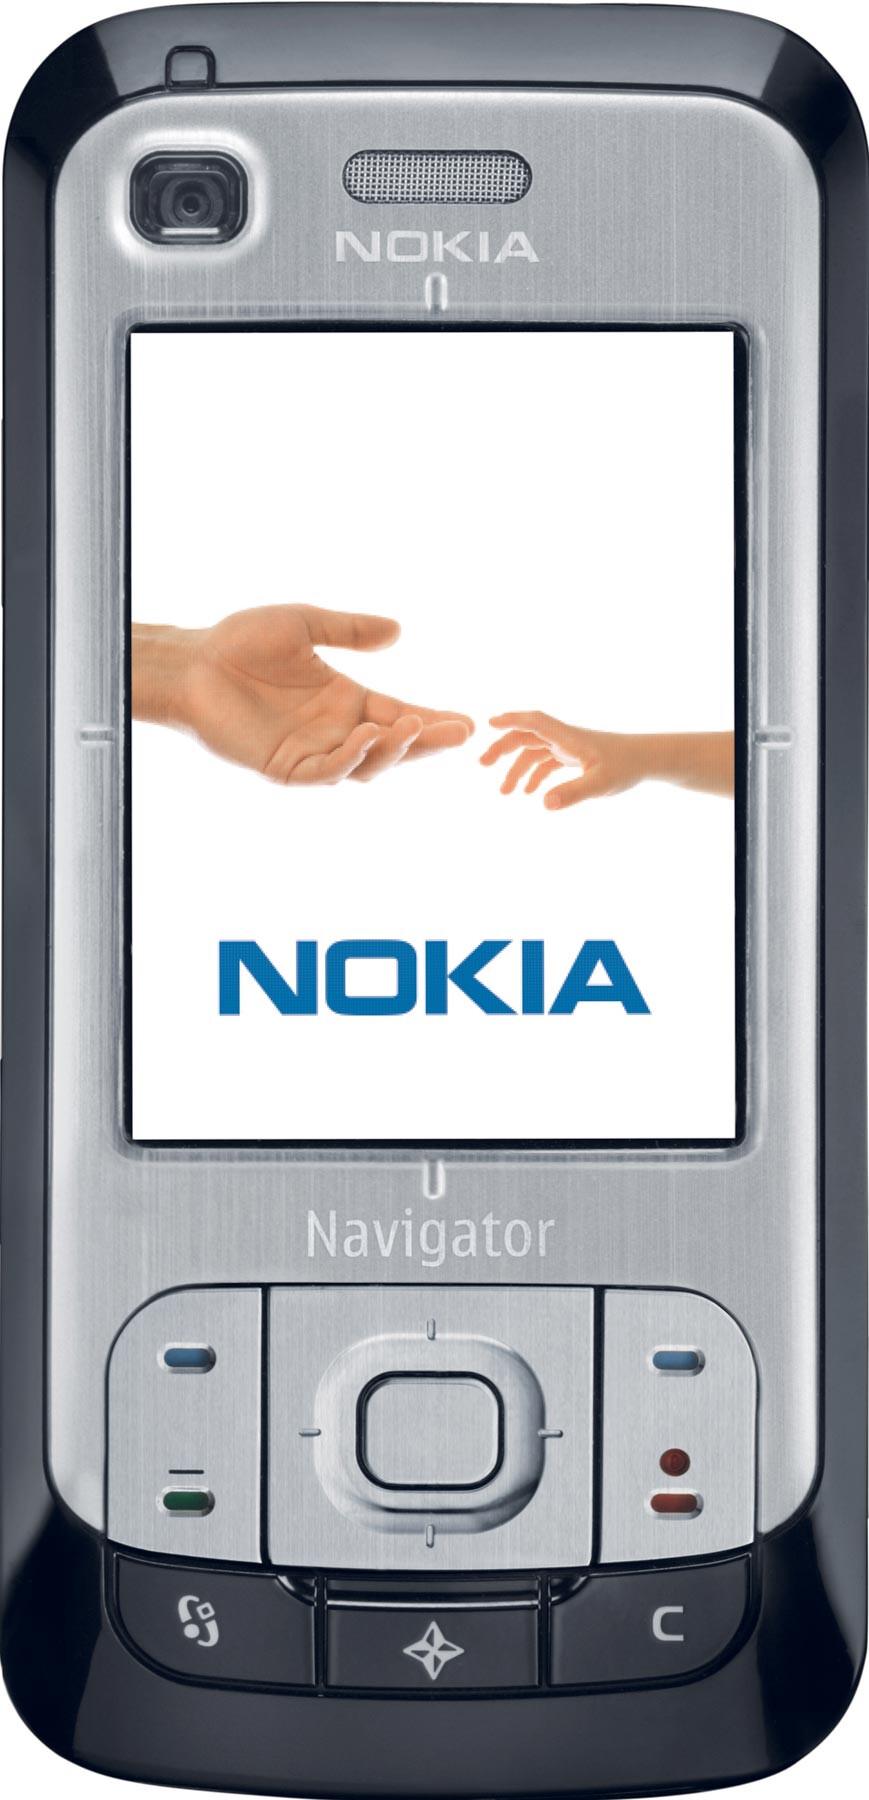 Nokia 6110 NAVIGATOR Size